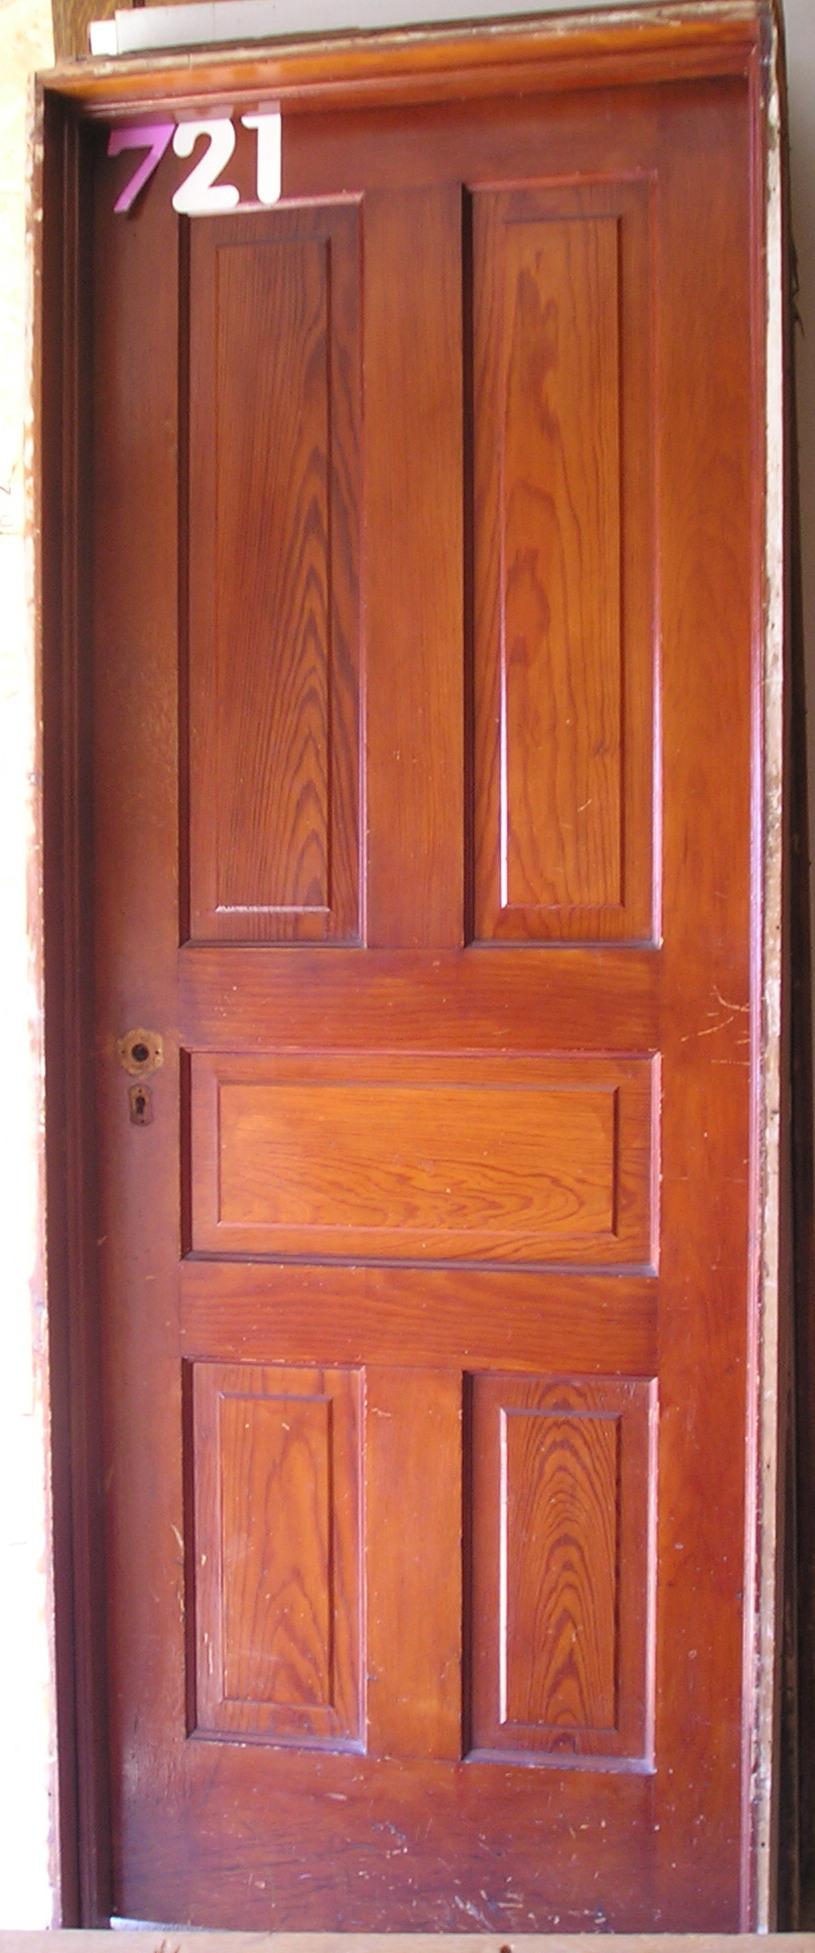 Victorian 5 Panel Style Door Nd Millwerk Salvage And Sales